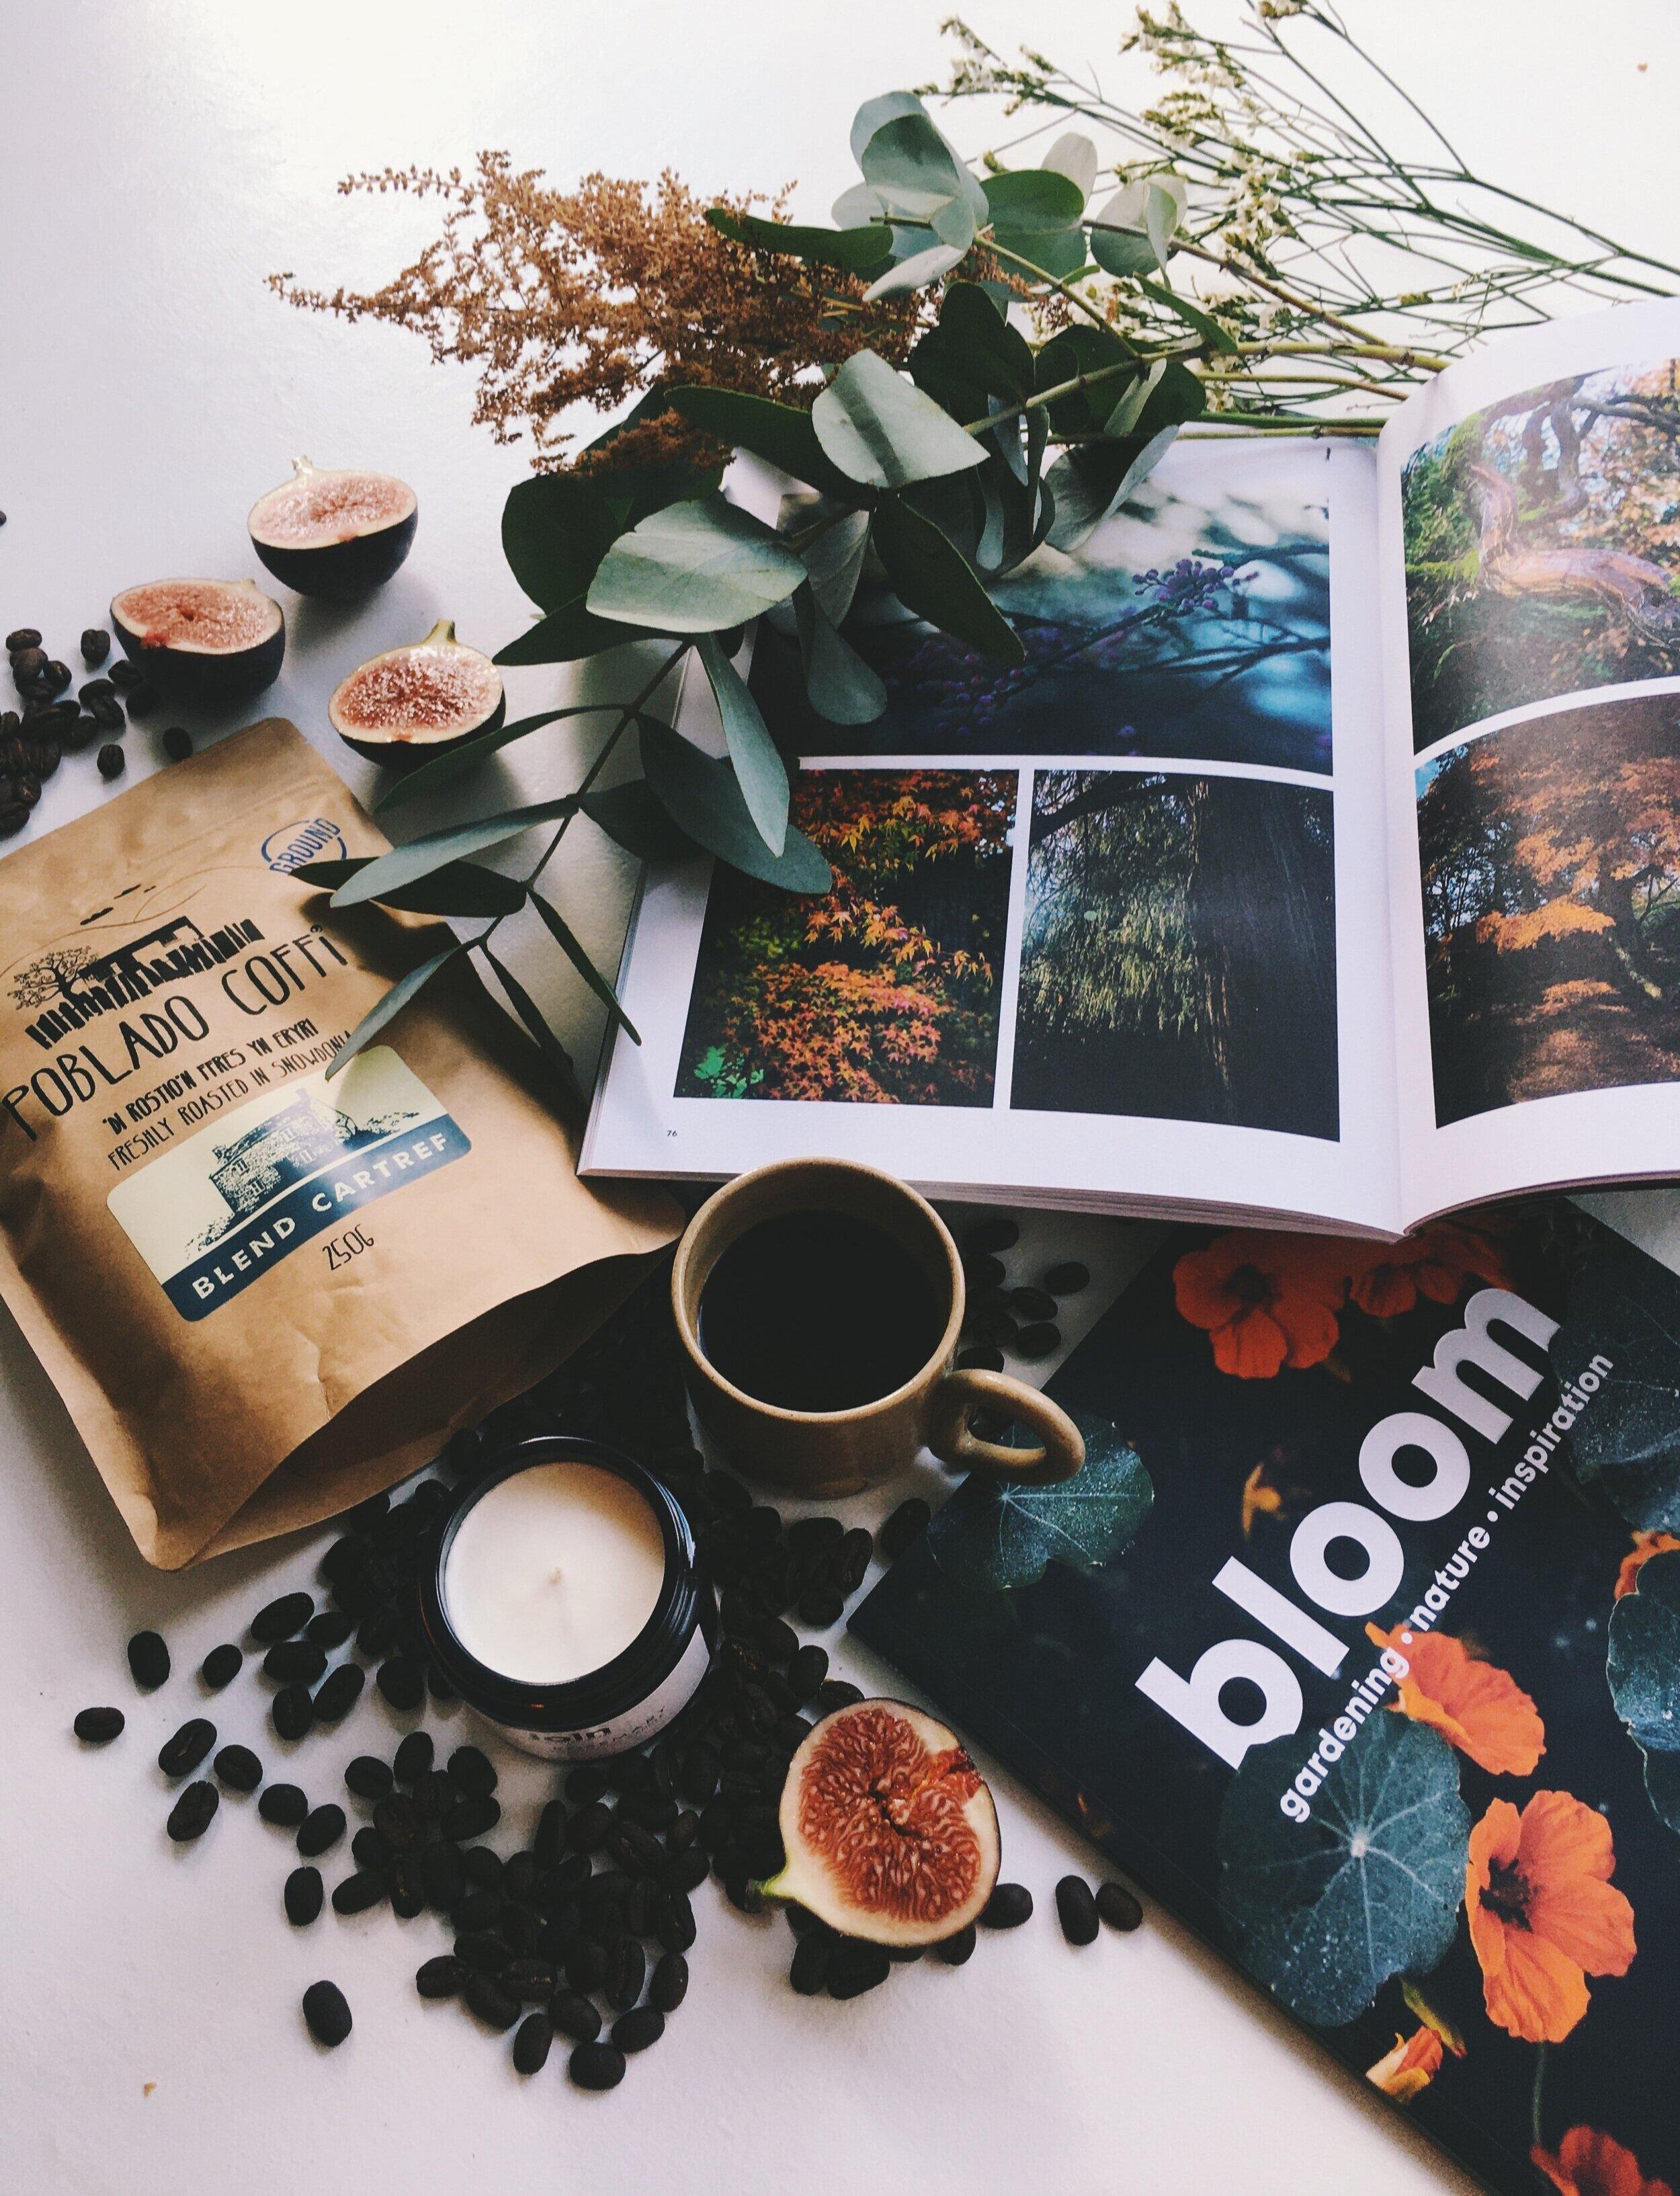 Firain-Autumn-Winter+2019.jpg